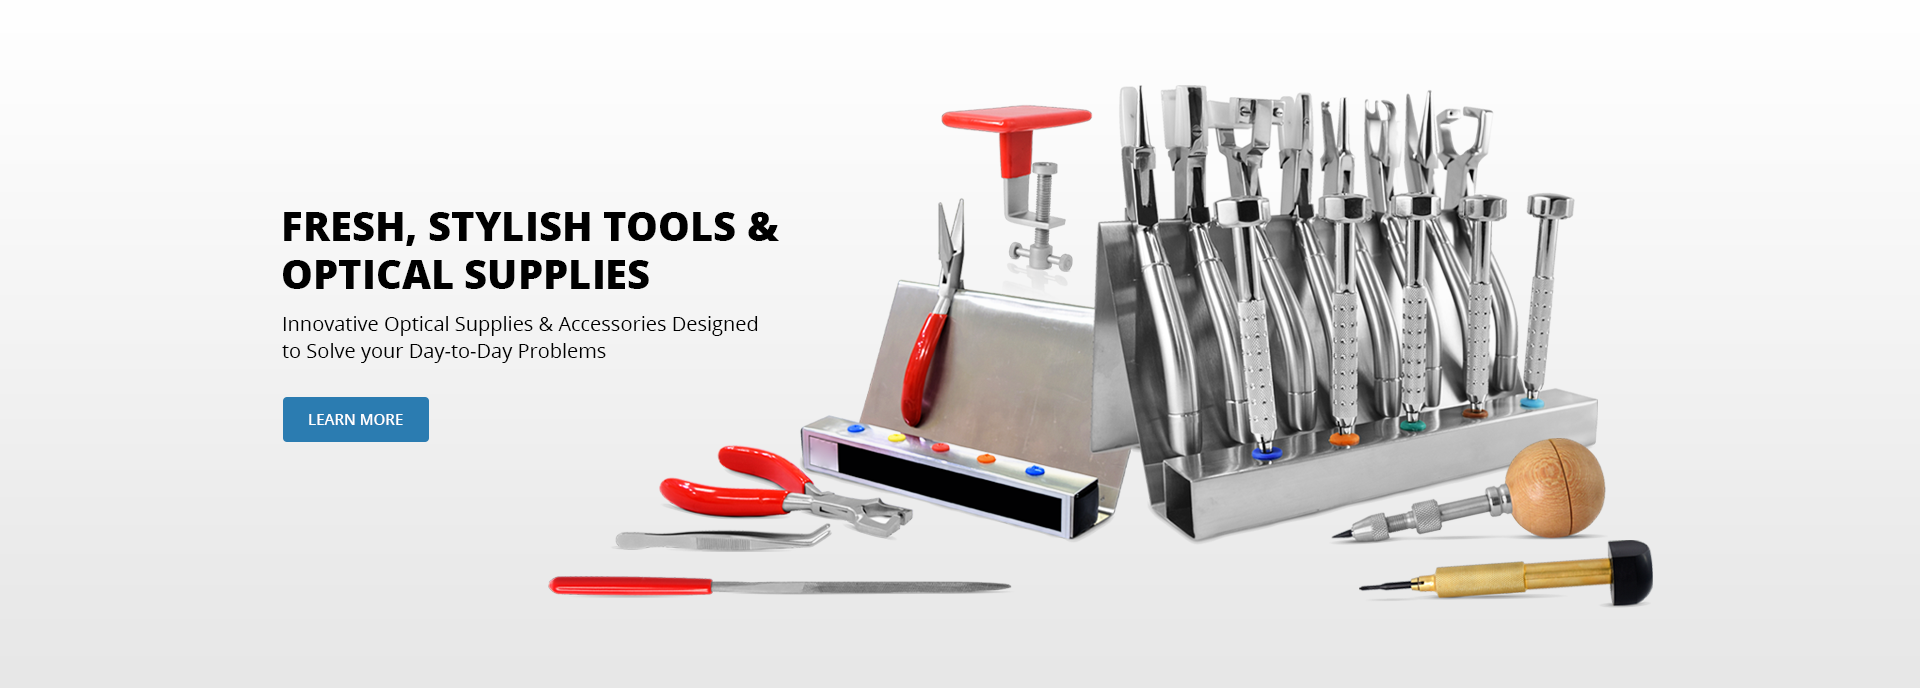 Optical Tool Manufacturing & Suppliers - Vertex International